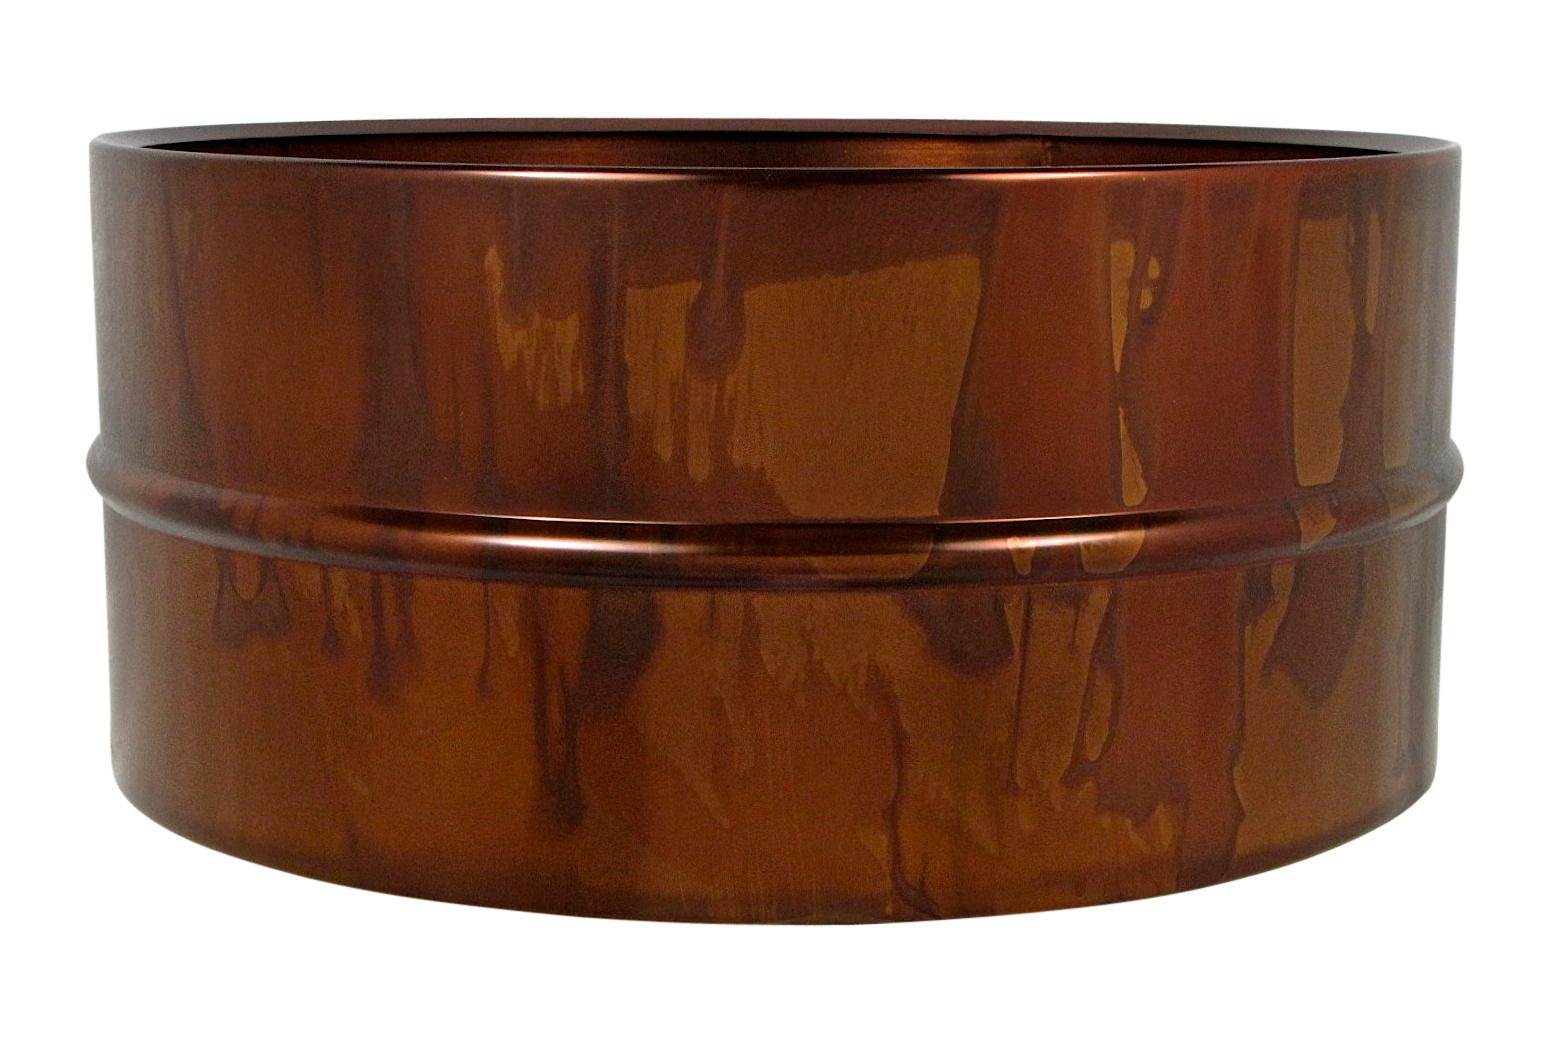 Vintage Drum Shells 72